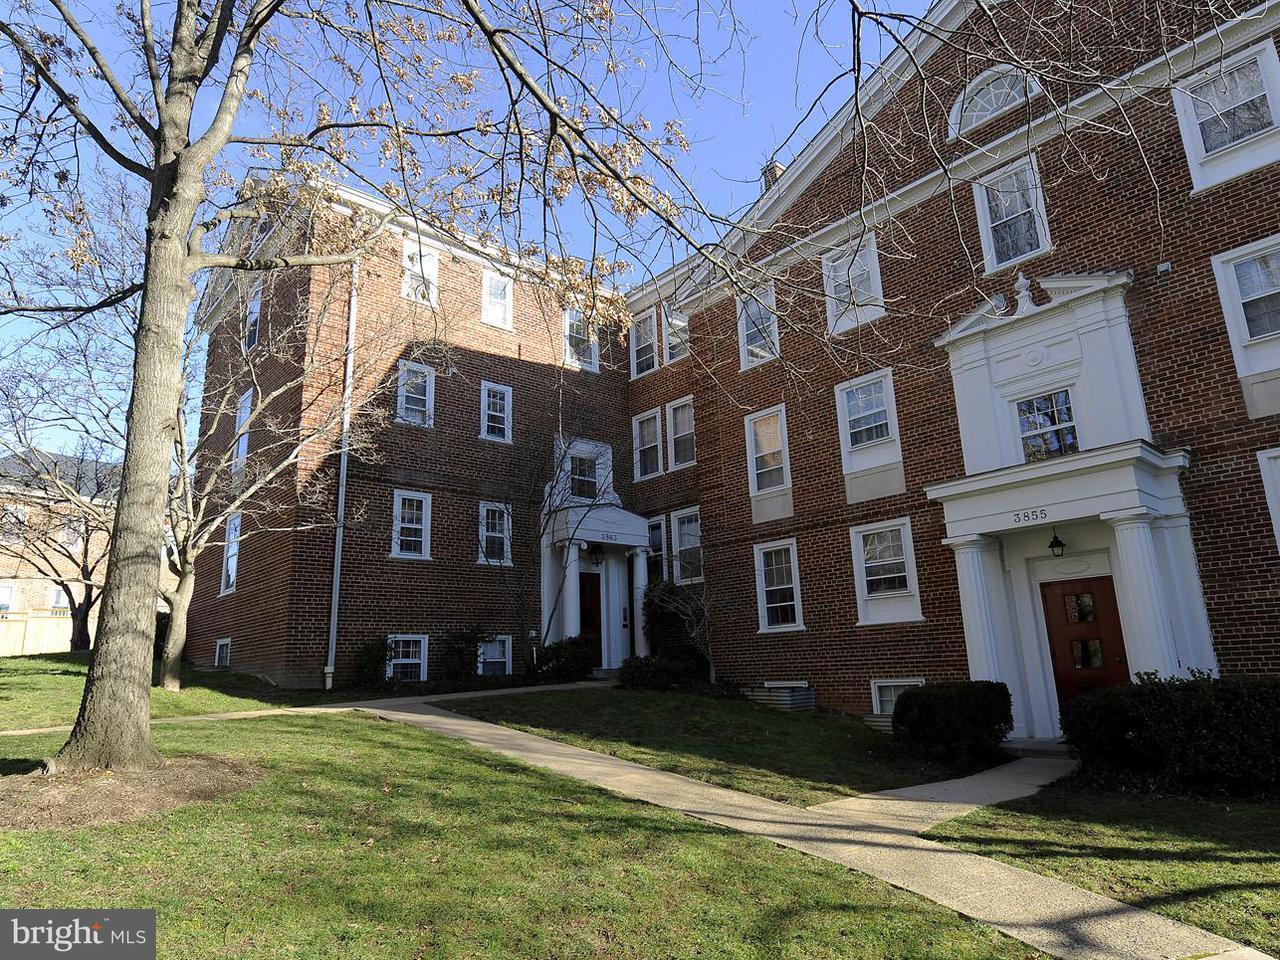 Condominium for Rent at 3863 Rodman St NW #b50 Washington, District Of Columbia 20016 United States